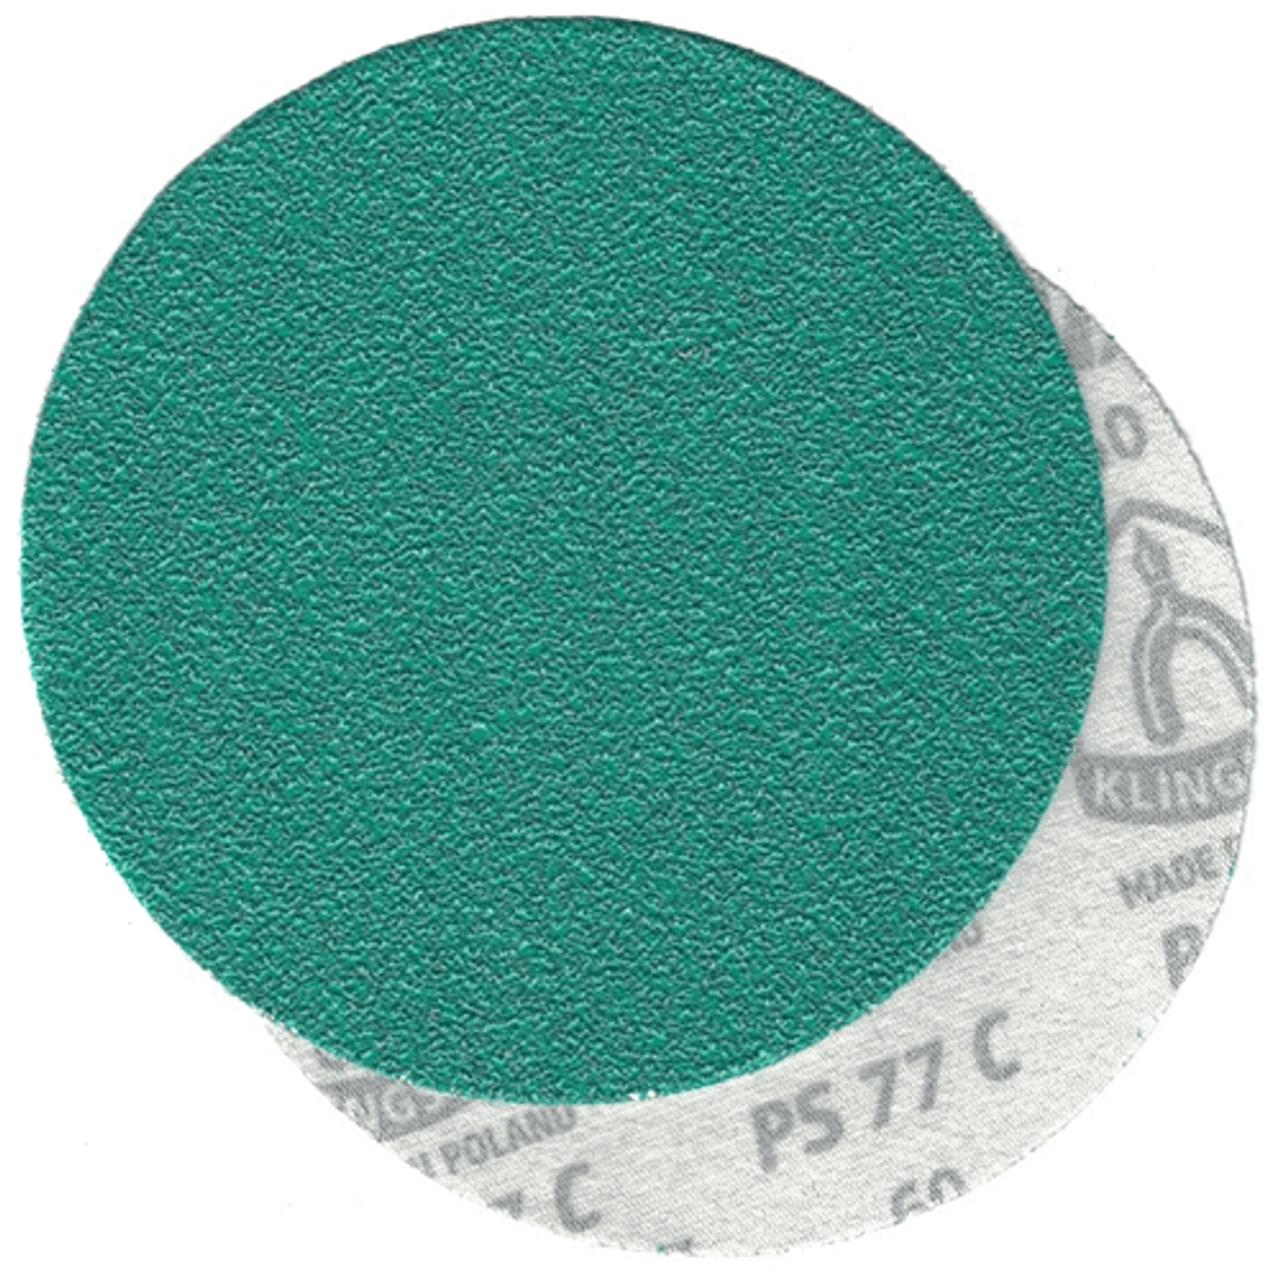 Klingspor Abrasives GreenTec 11 Inch H&L 180 Grit Disc 5pk